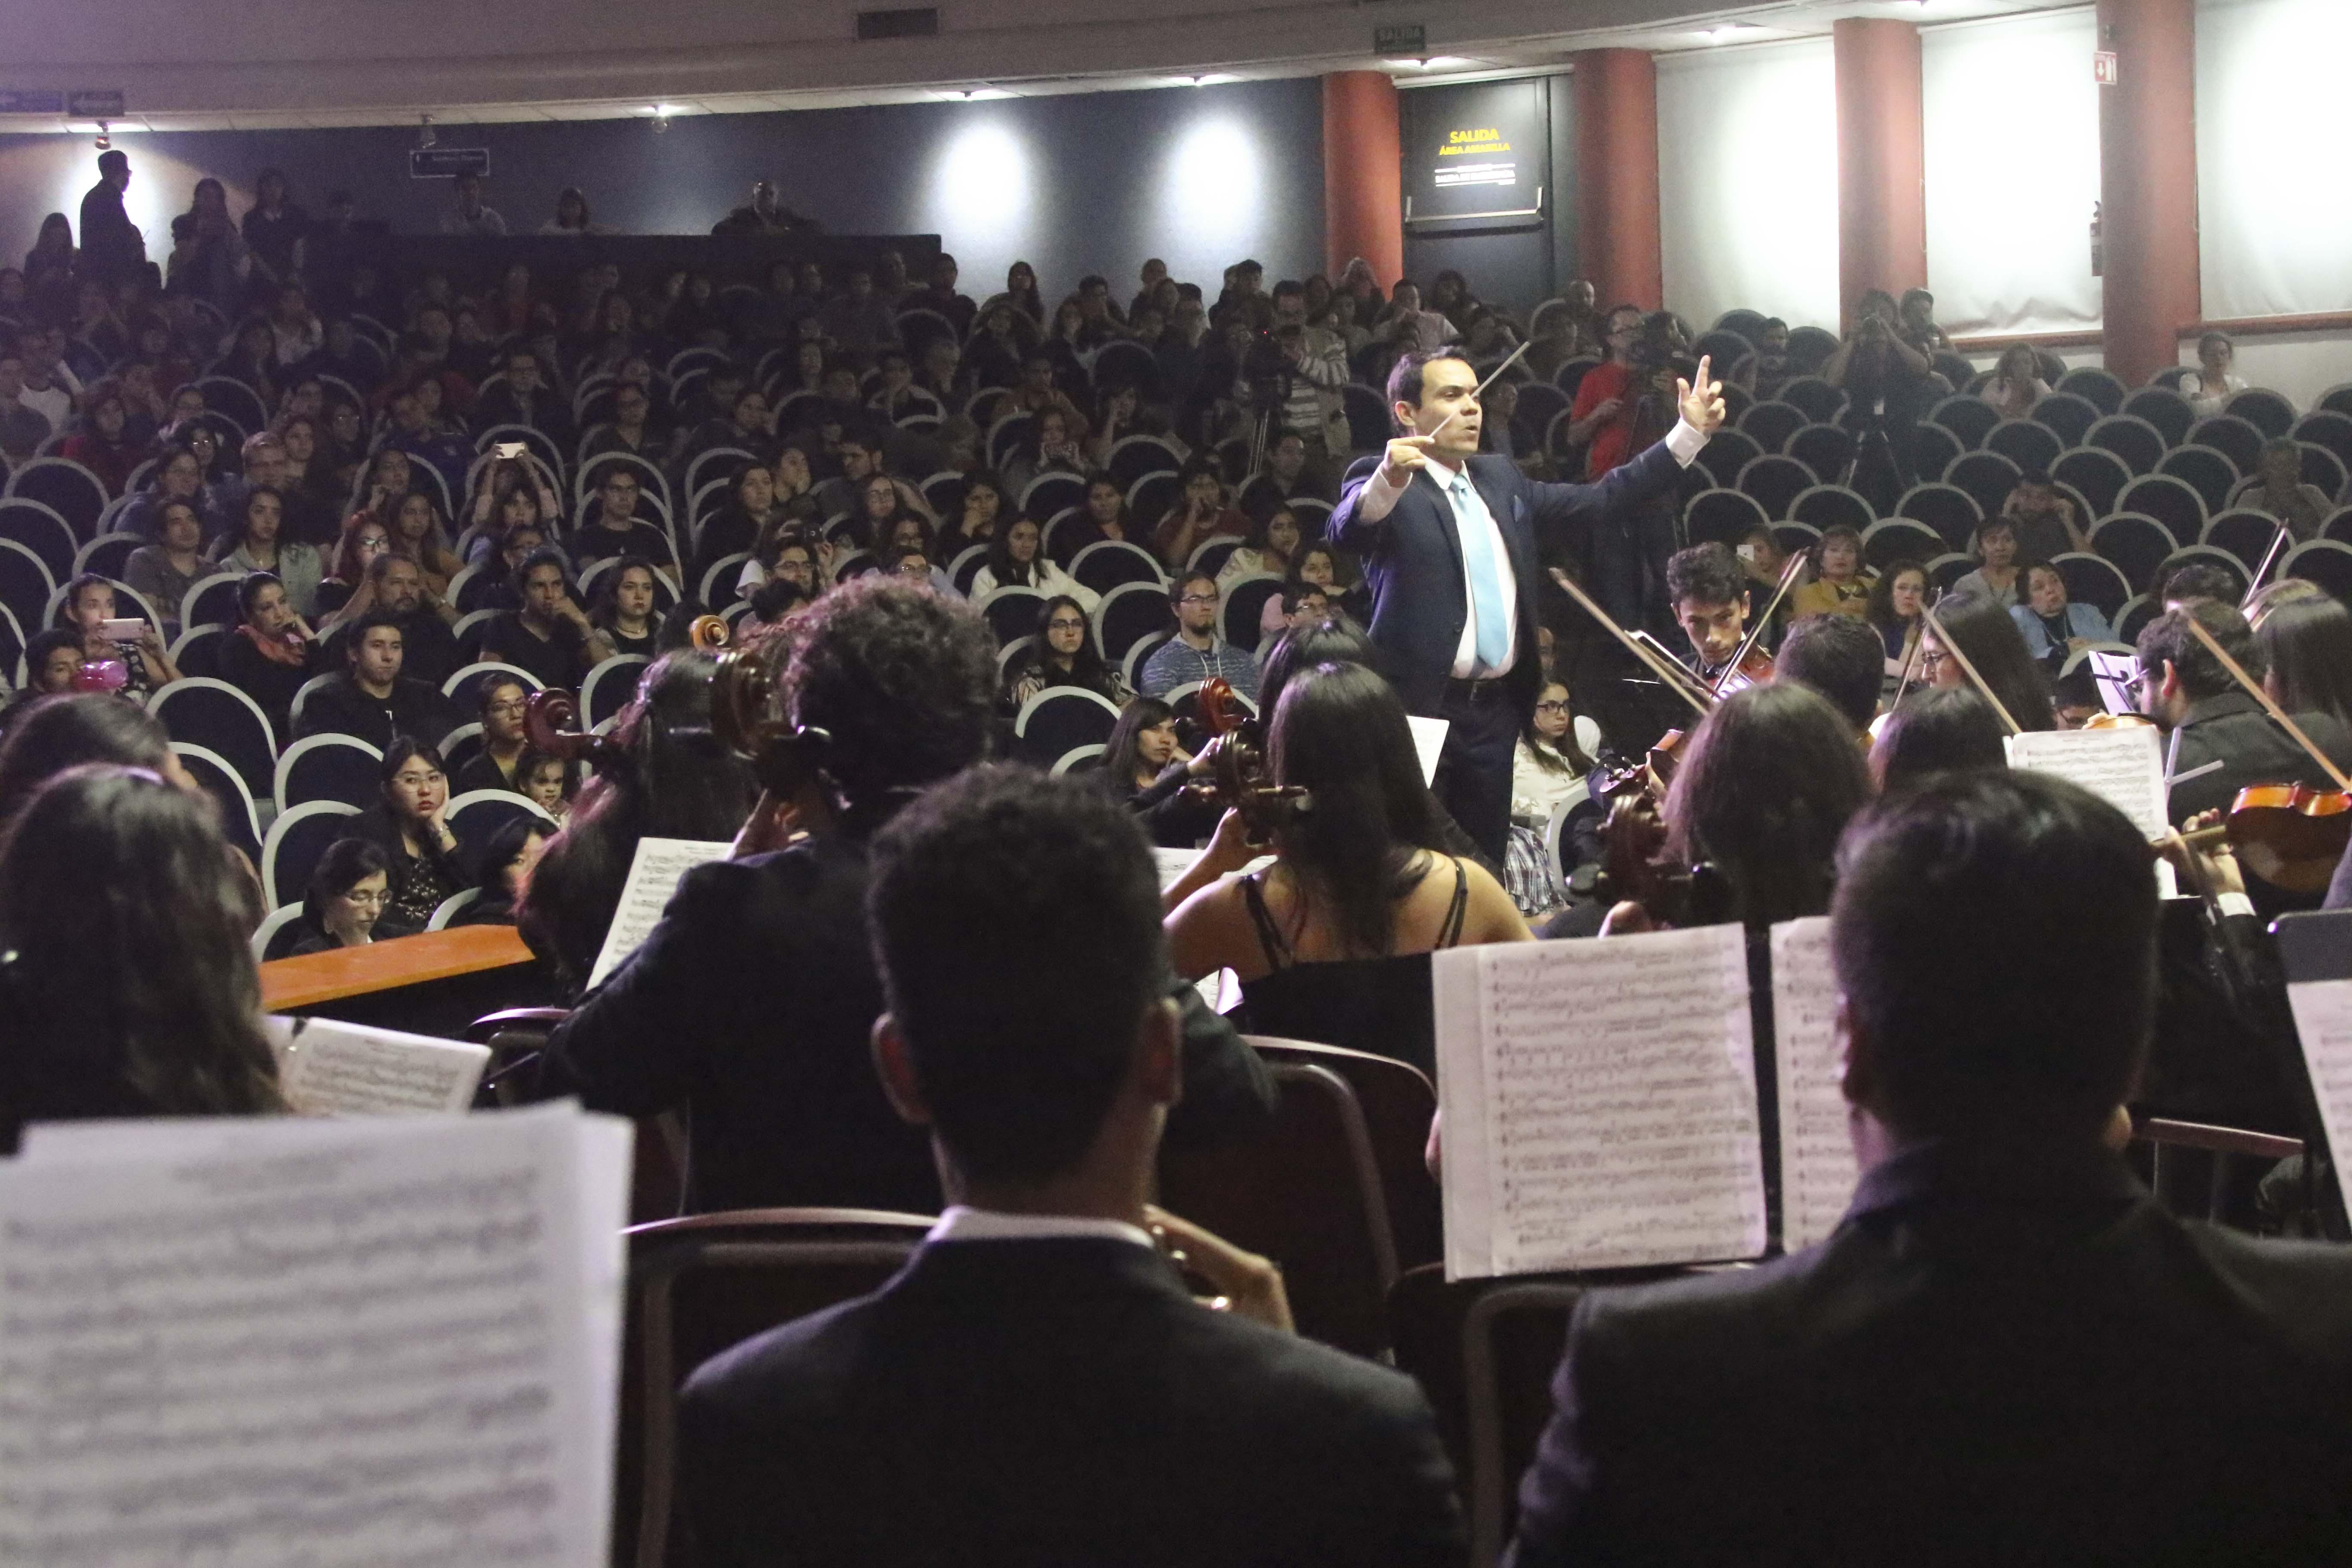 Músicos en pleno concierto. Director al fondo alzando la batuta